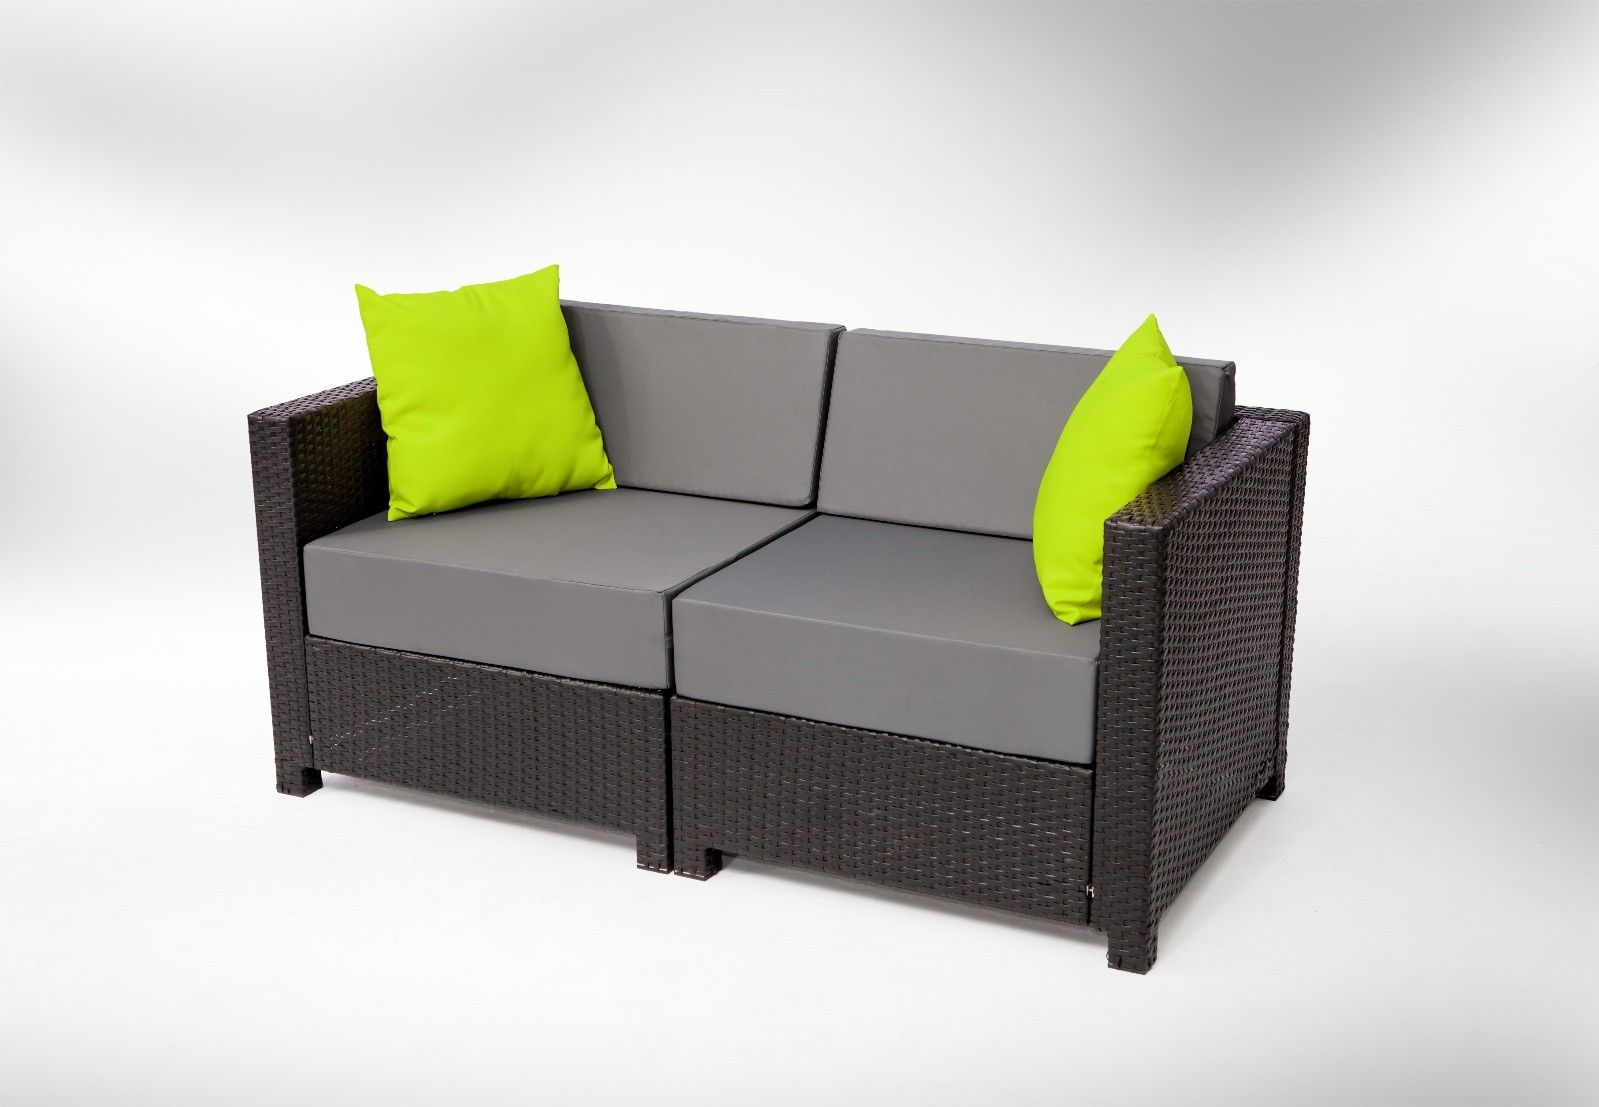 mcombo 7pc black wicker patio sectional indoor outdoor sofa furniture set grey ebay. Black Bedroom Furniture Sets. Home Design Ideas